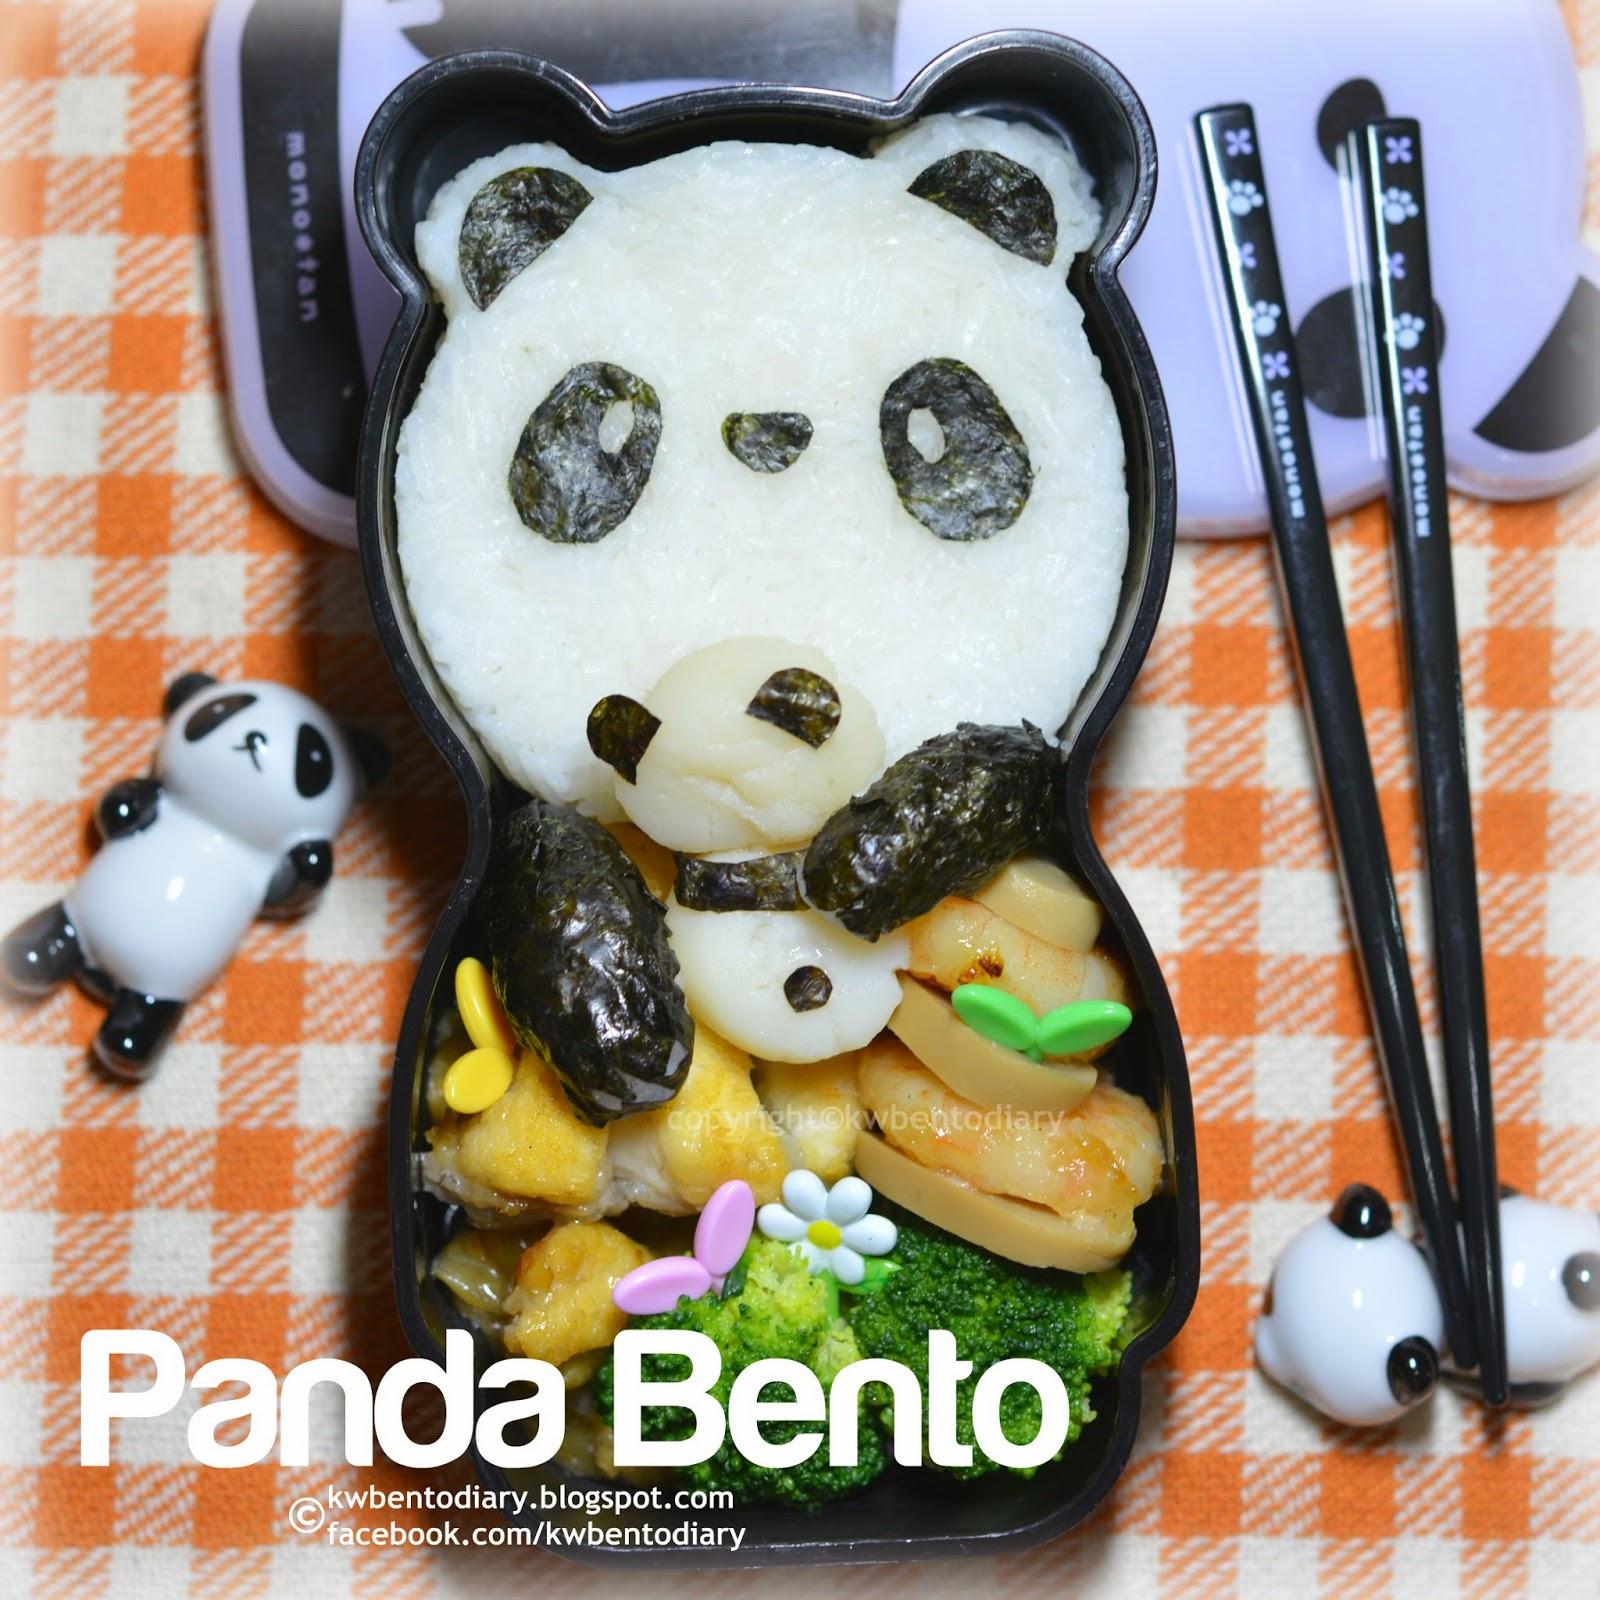 karenwee 39 s bento diary bento2014 apr28 panda bento. Black Bedroom Furniture Sets. Home Design Ideas